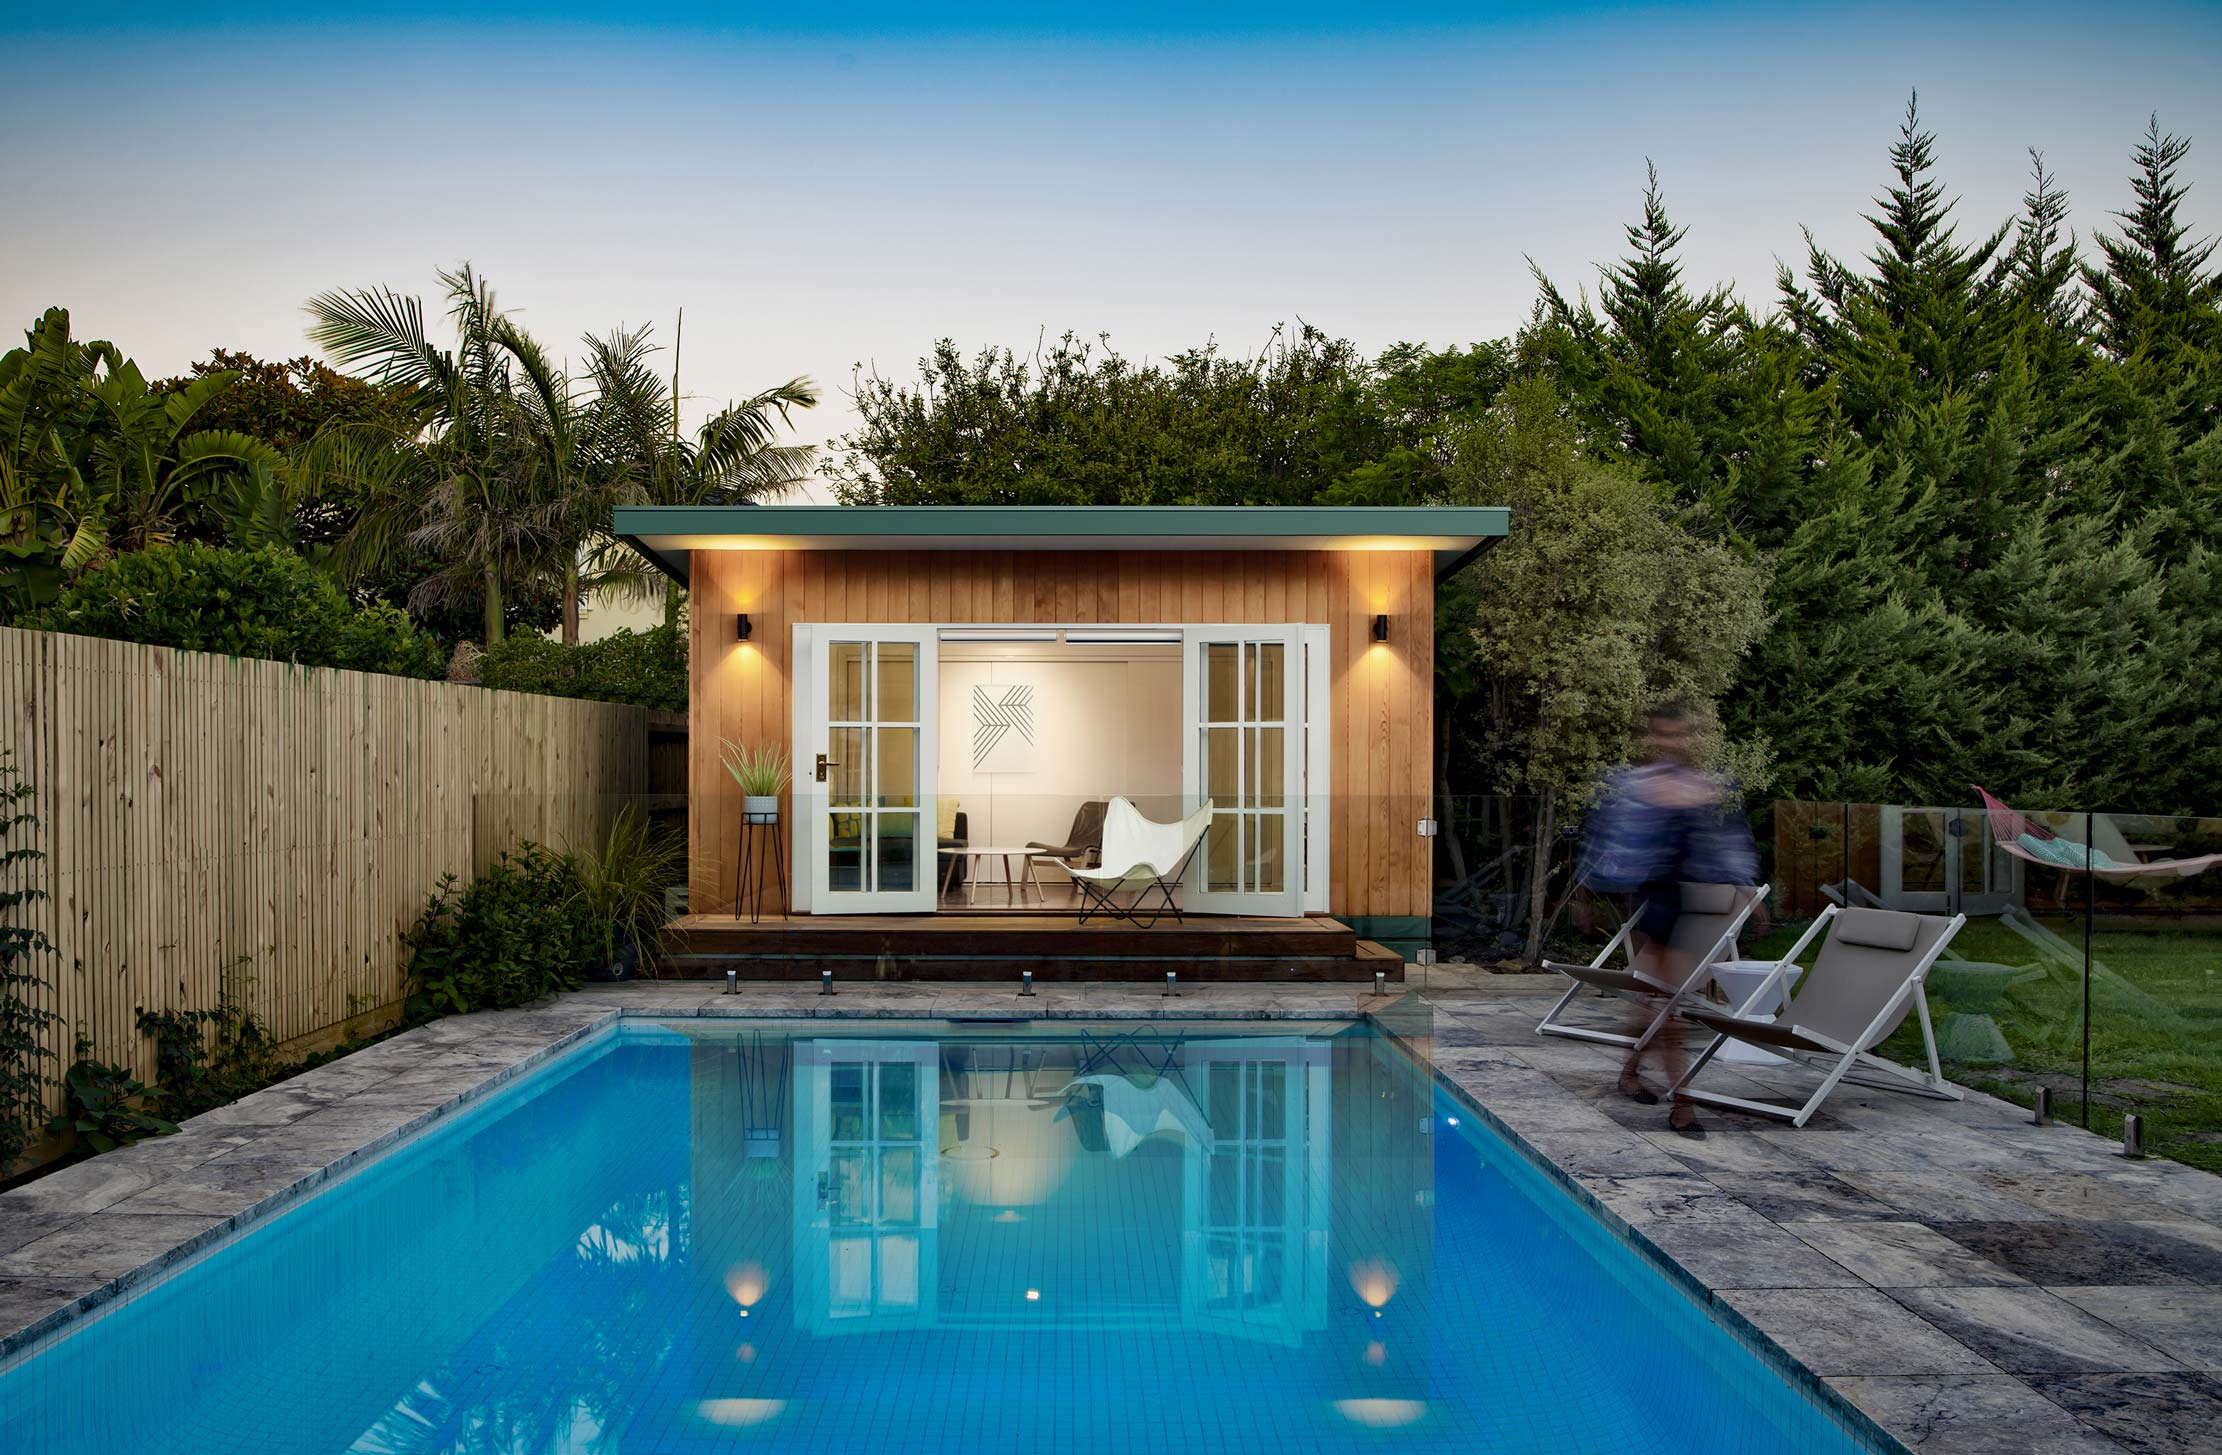 Pei Granny Flat Design | Garden Studios Melbourne